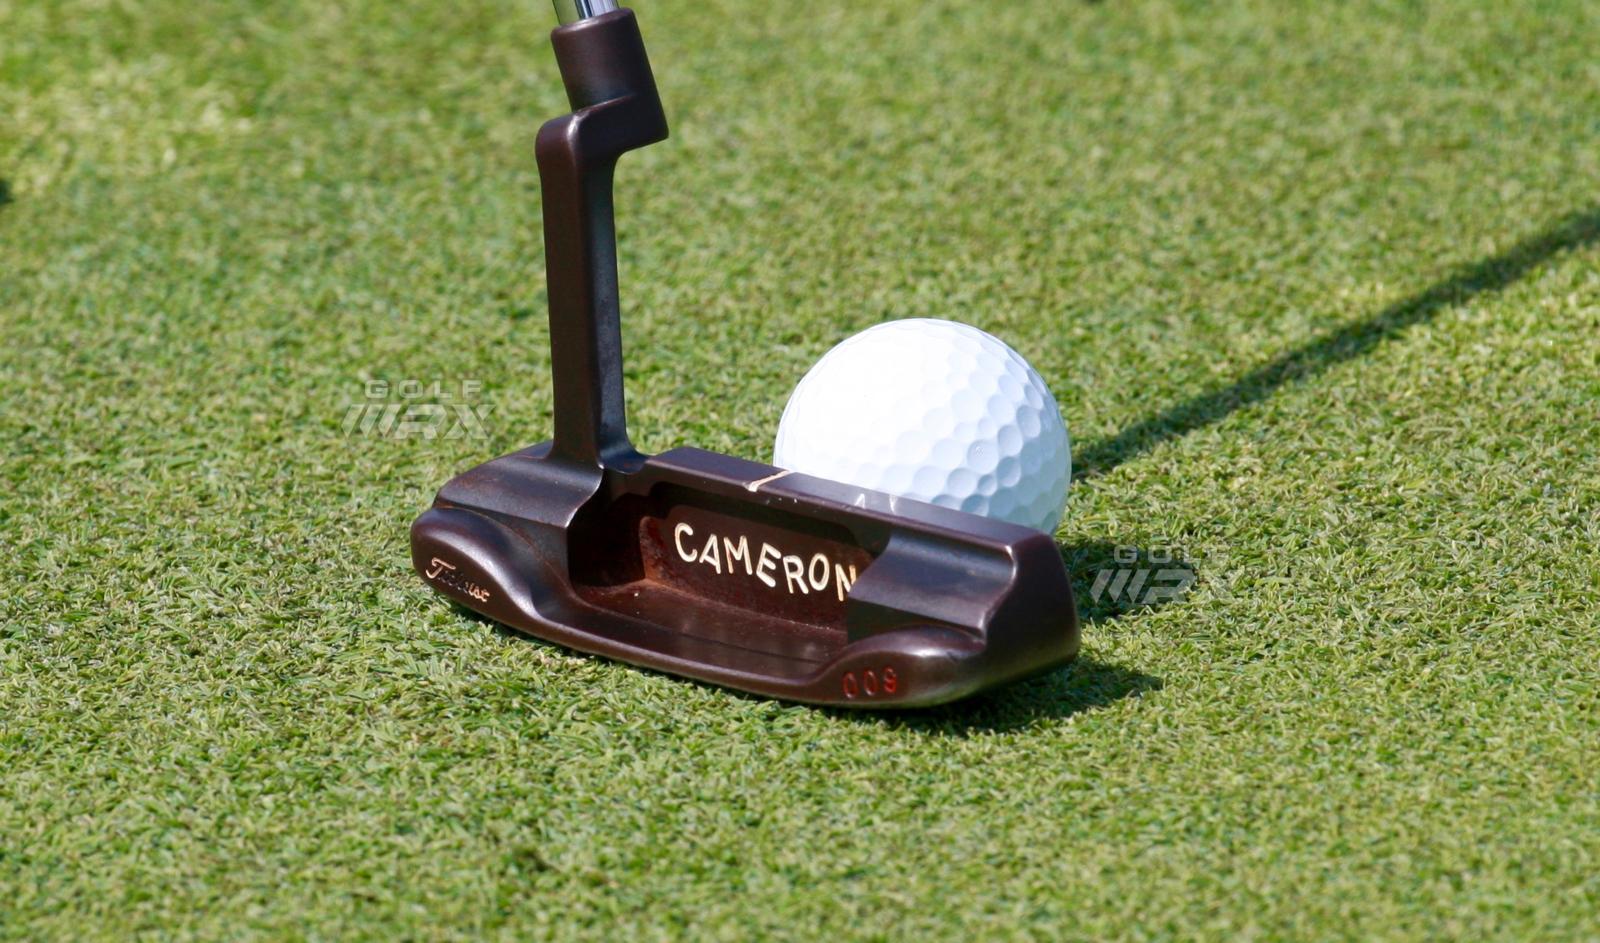 fe40cabc78 Jordan Spieth WITB 2016 – GolfWRX